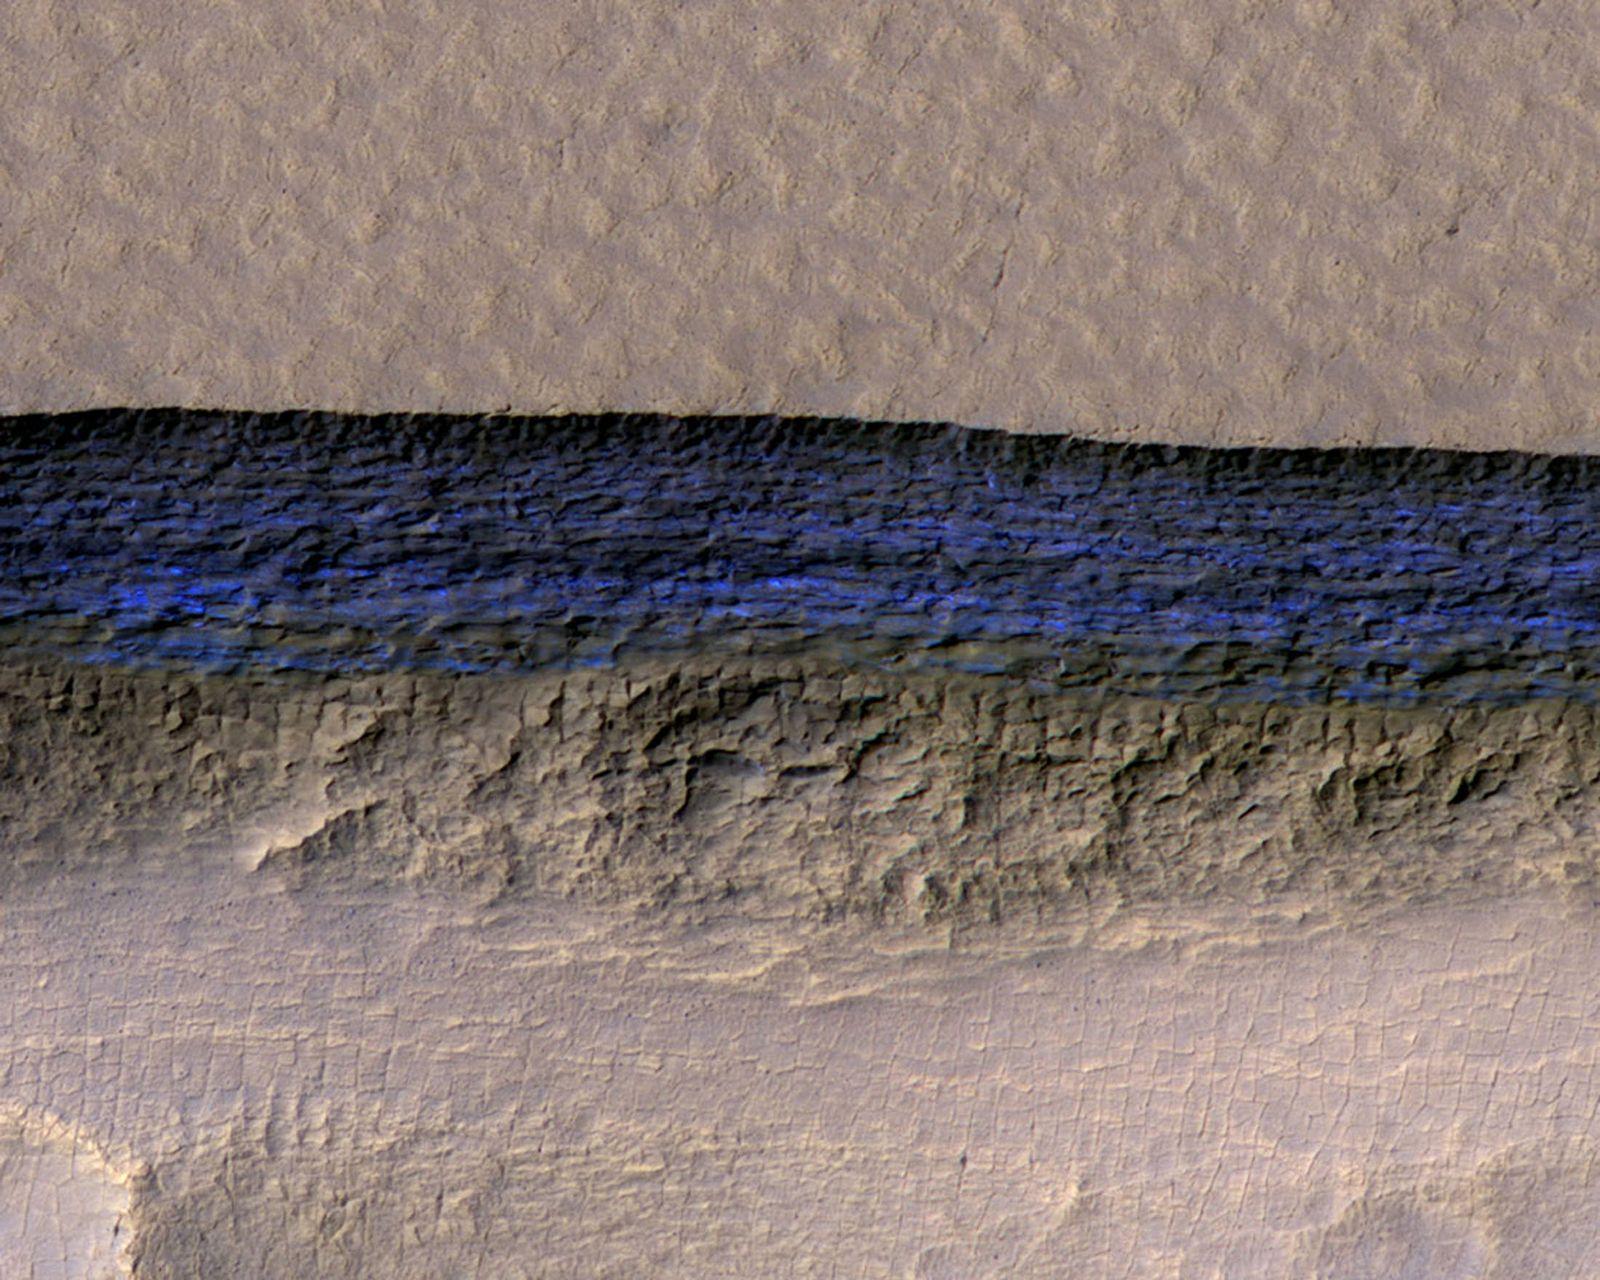 Eisadern/ Mars